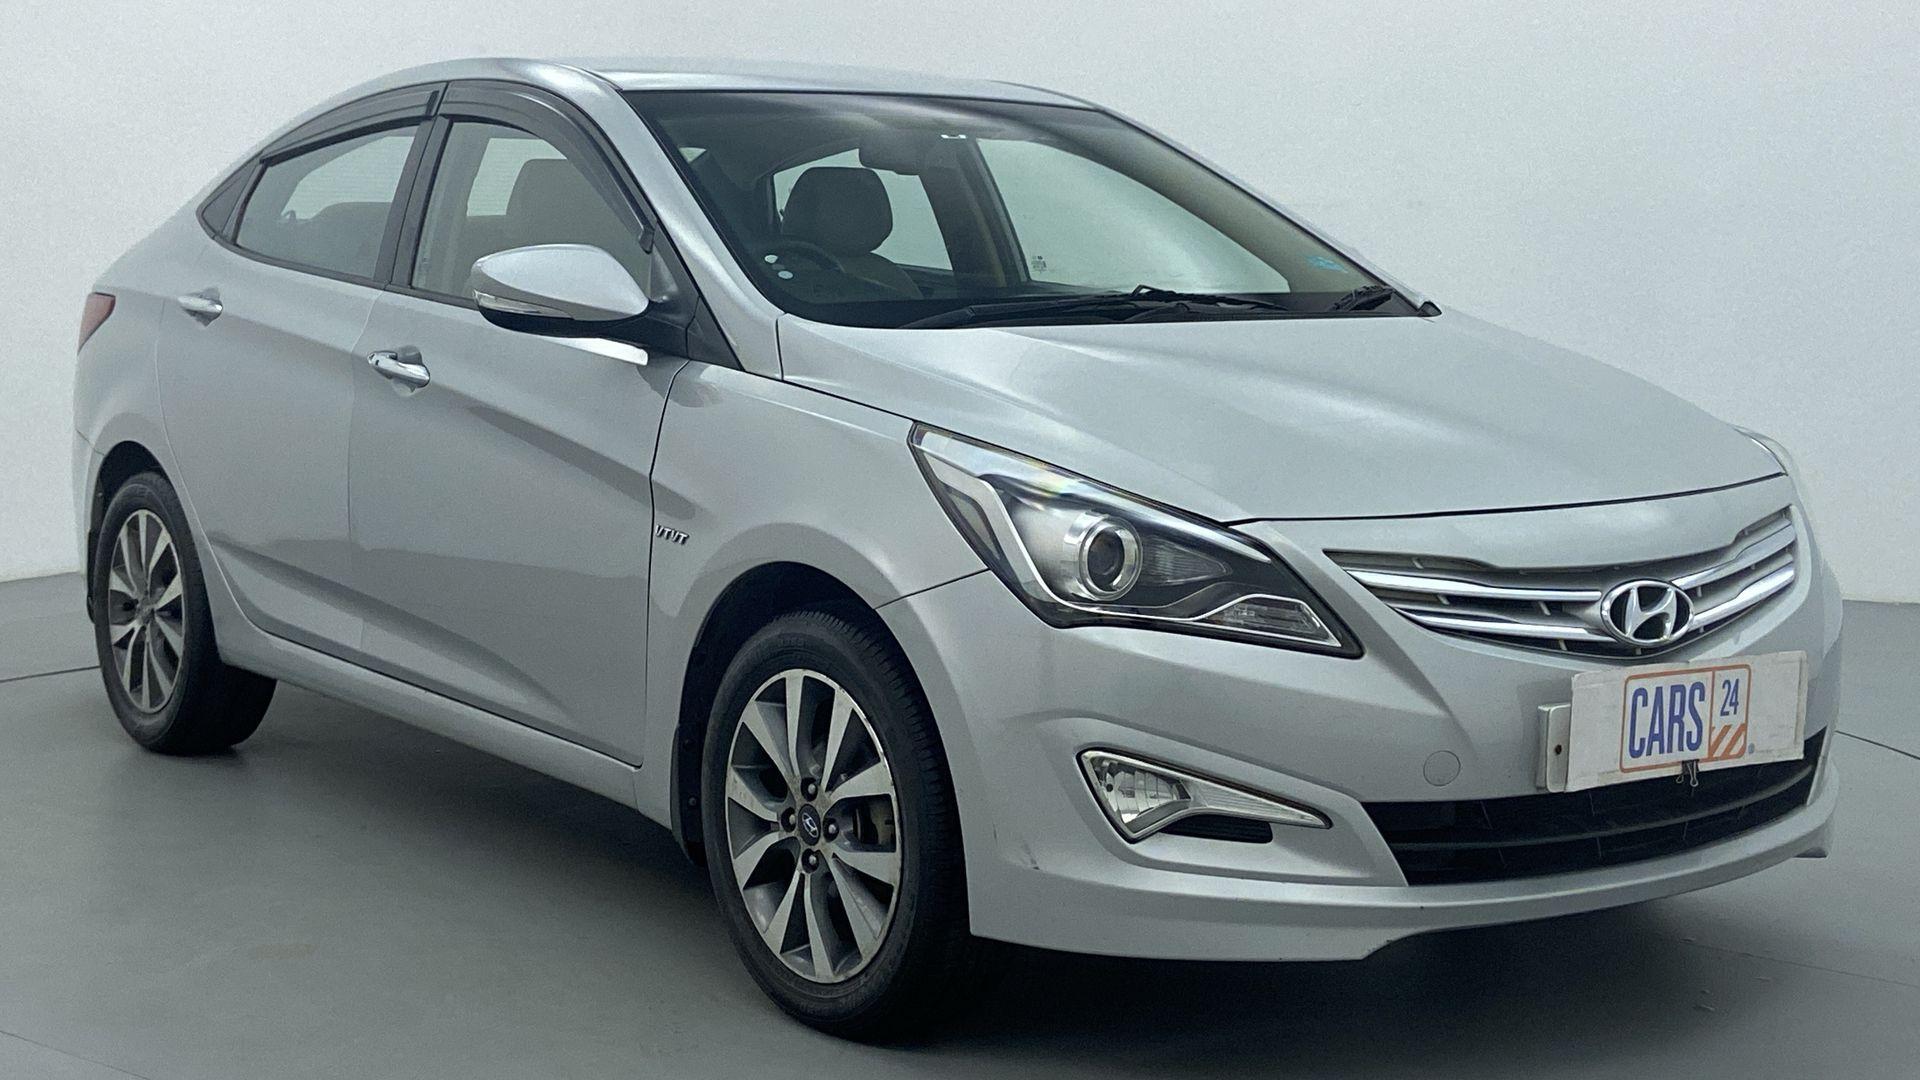 2015 Hyundai Verna FLUIDIC 1.6 VTVT S (O)  MT